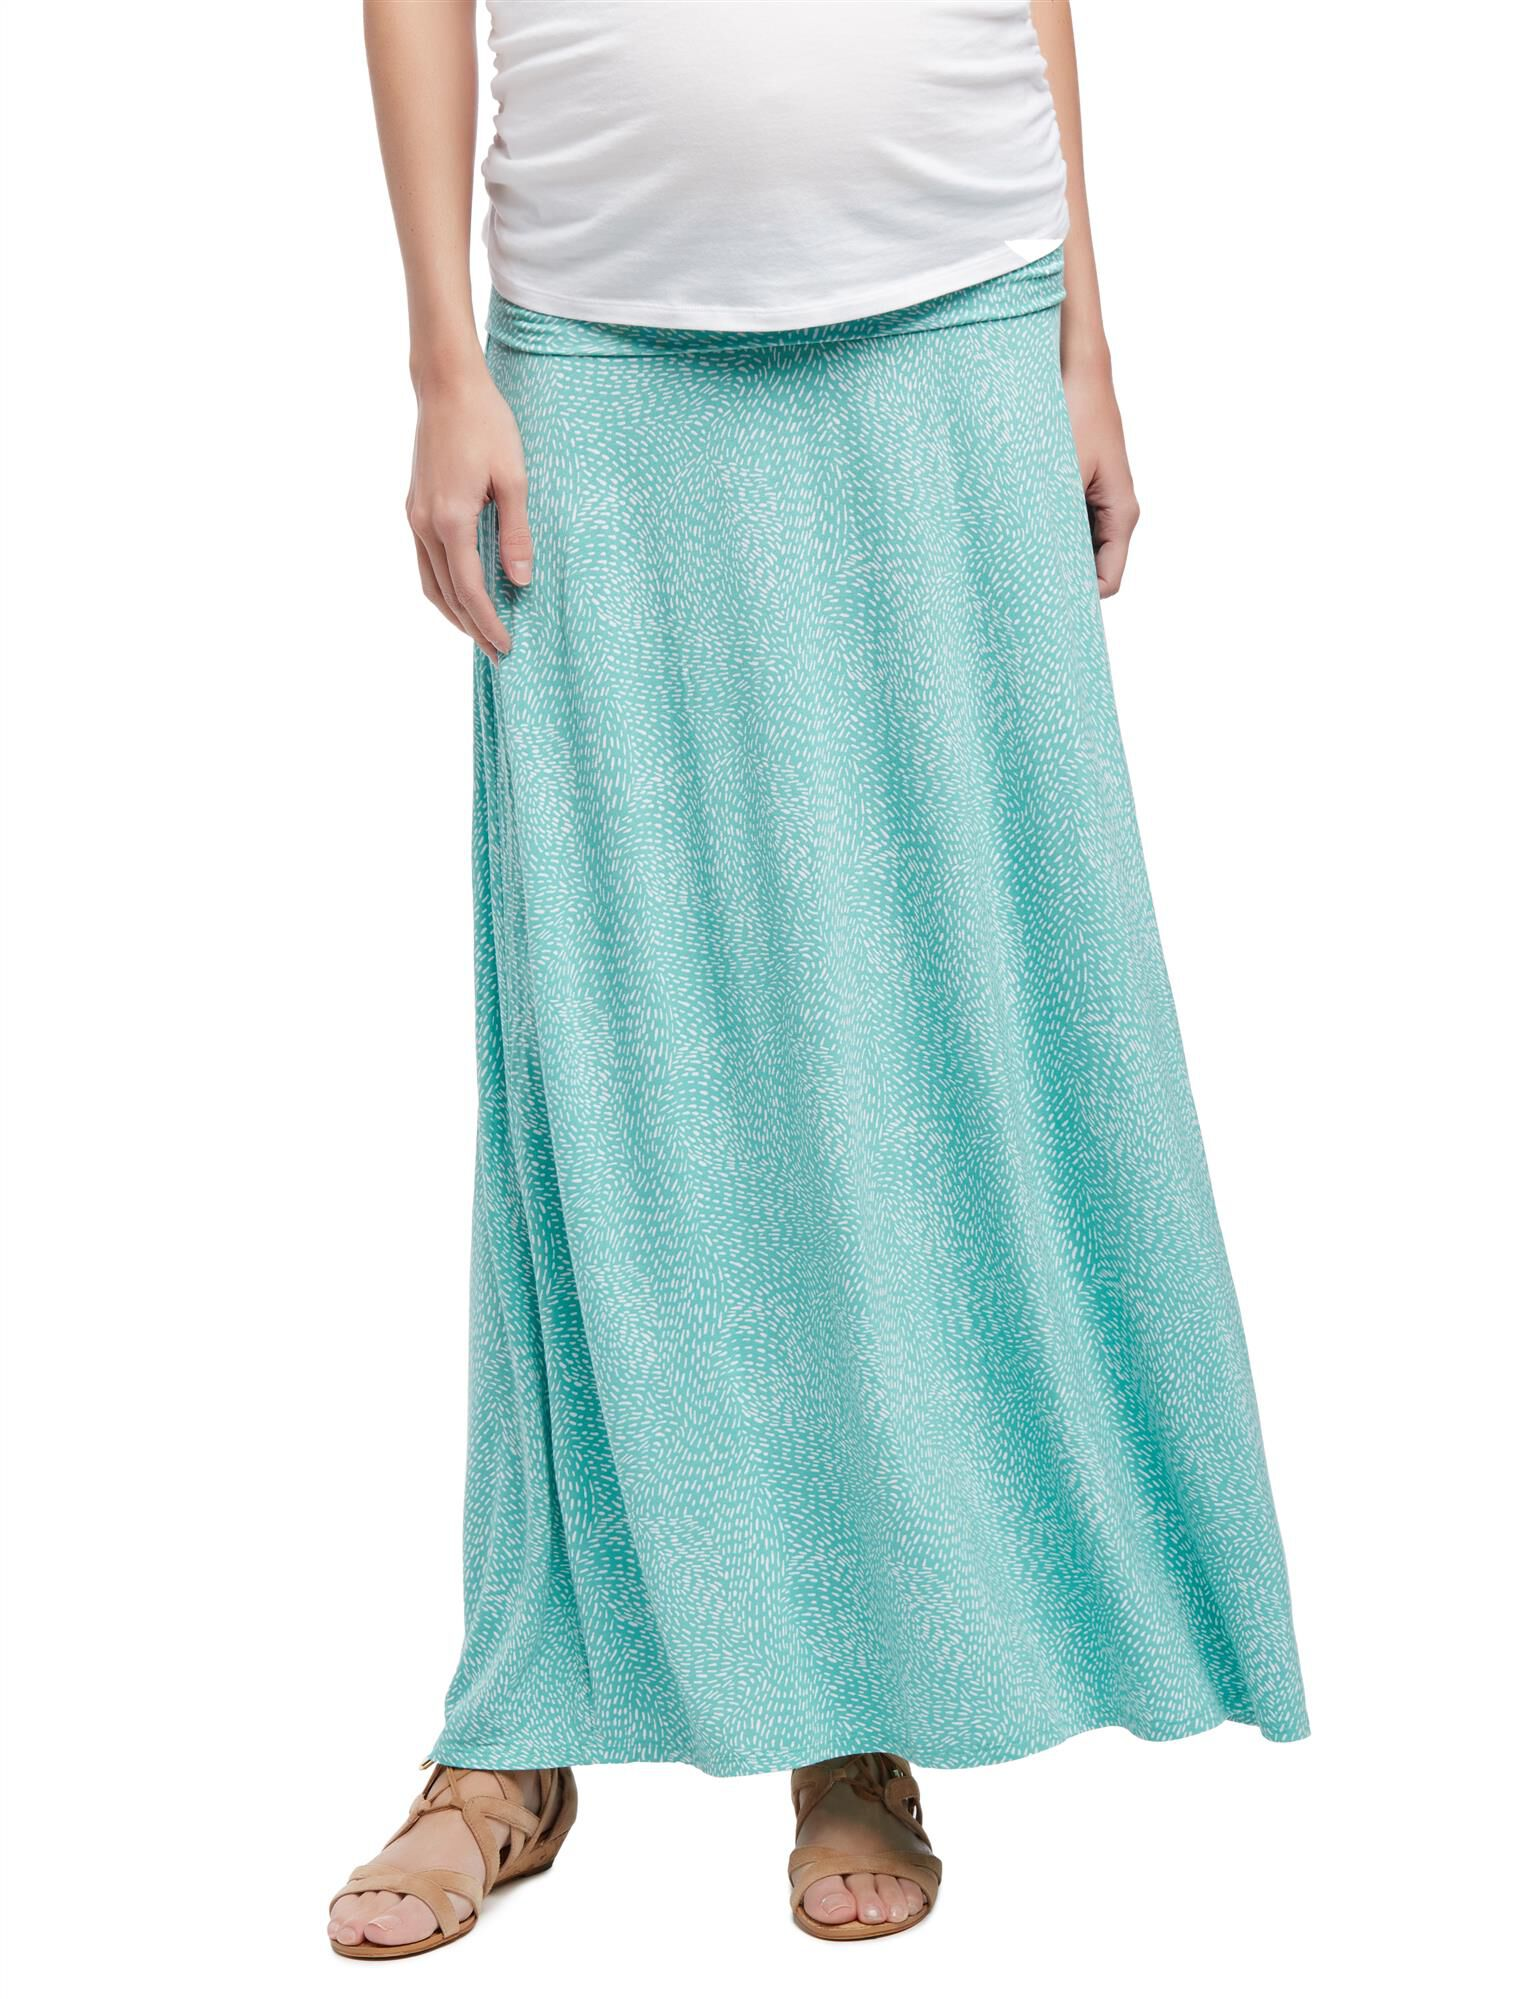 Fold Over Belly Printed Maternity Skirt- Aqua Swirl